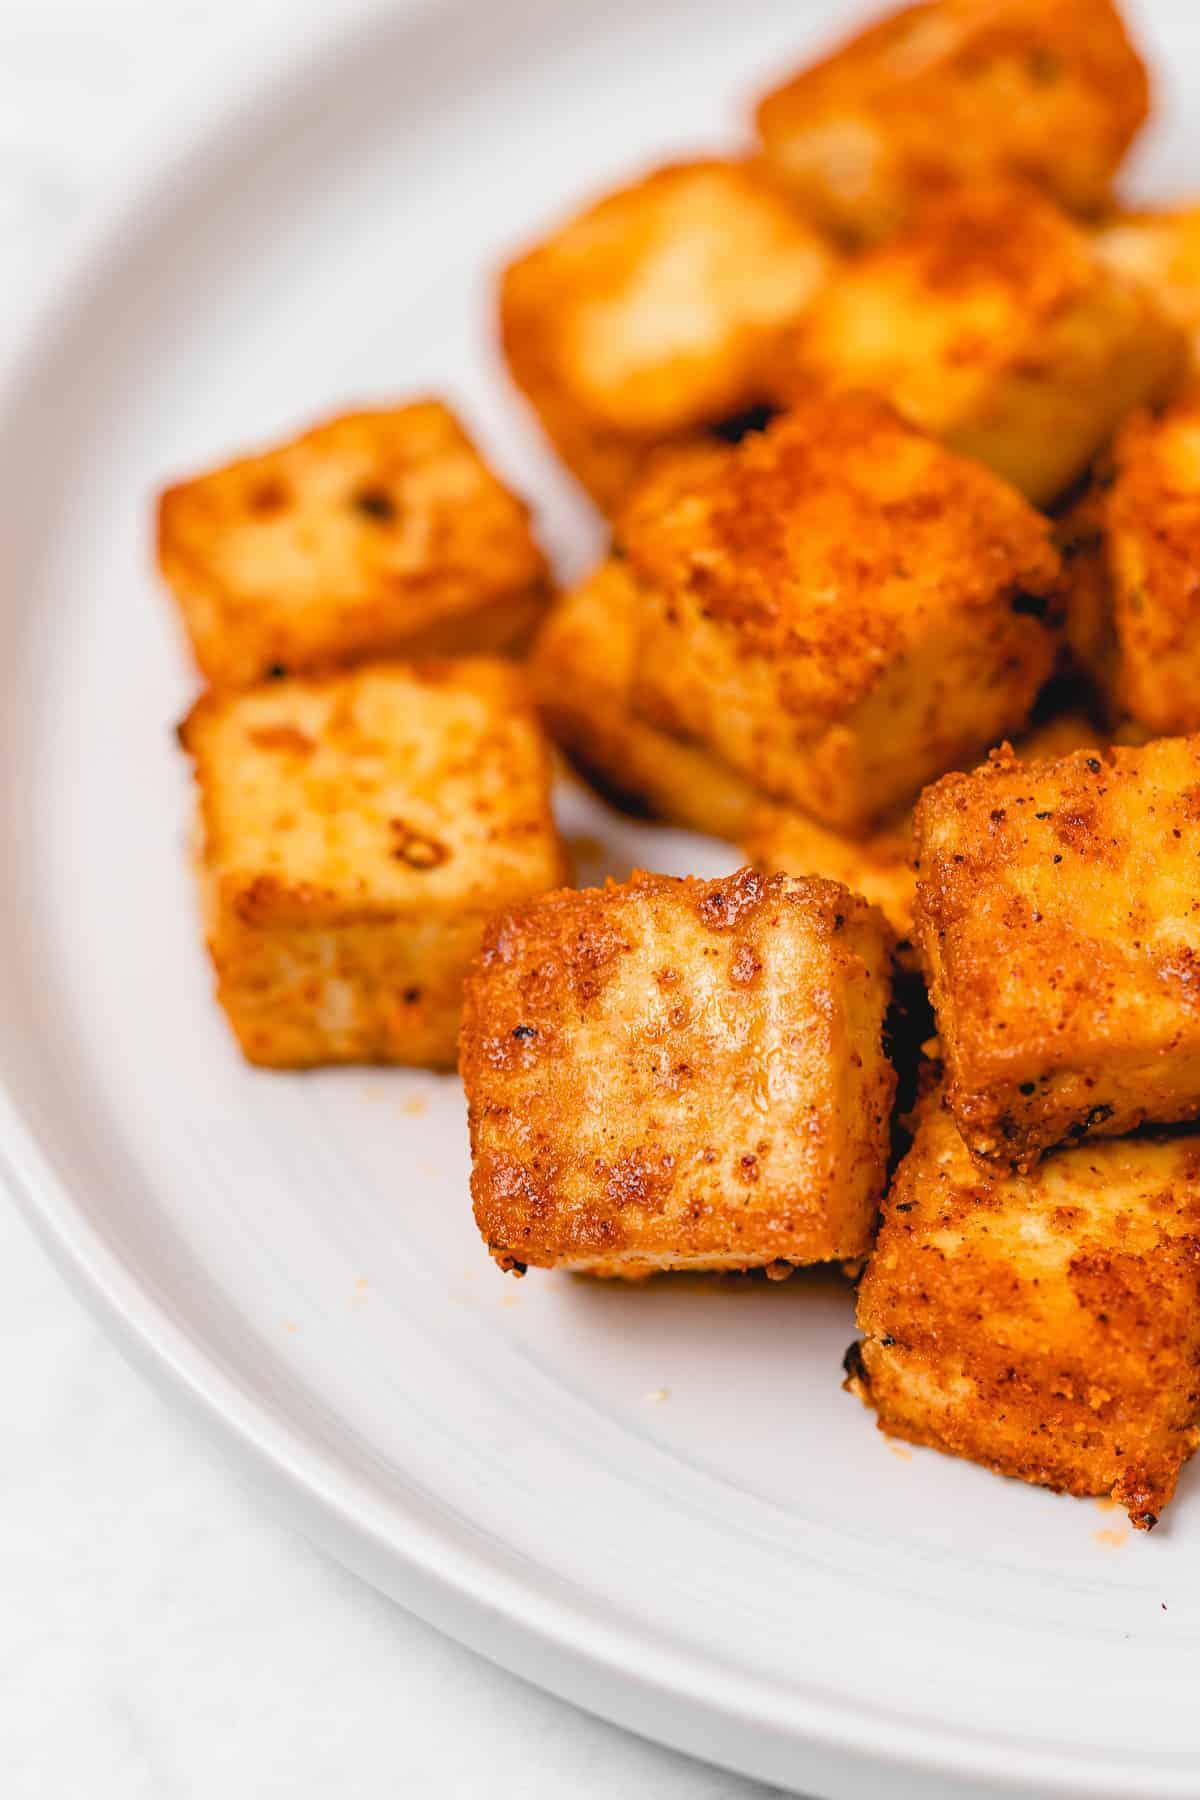 Close-up shot of crispy tofu cubes on a white ceramic plate